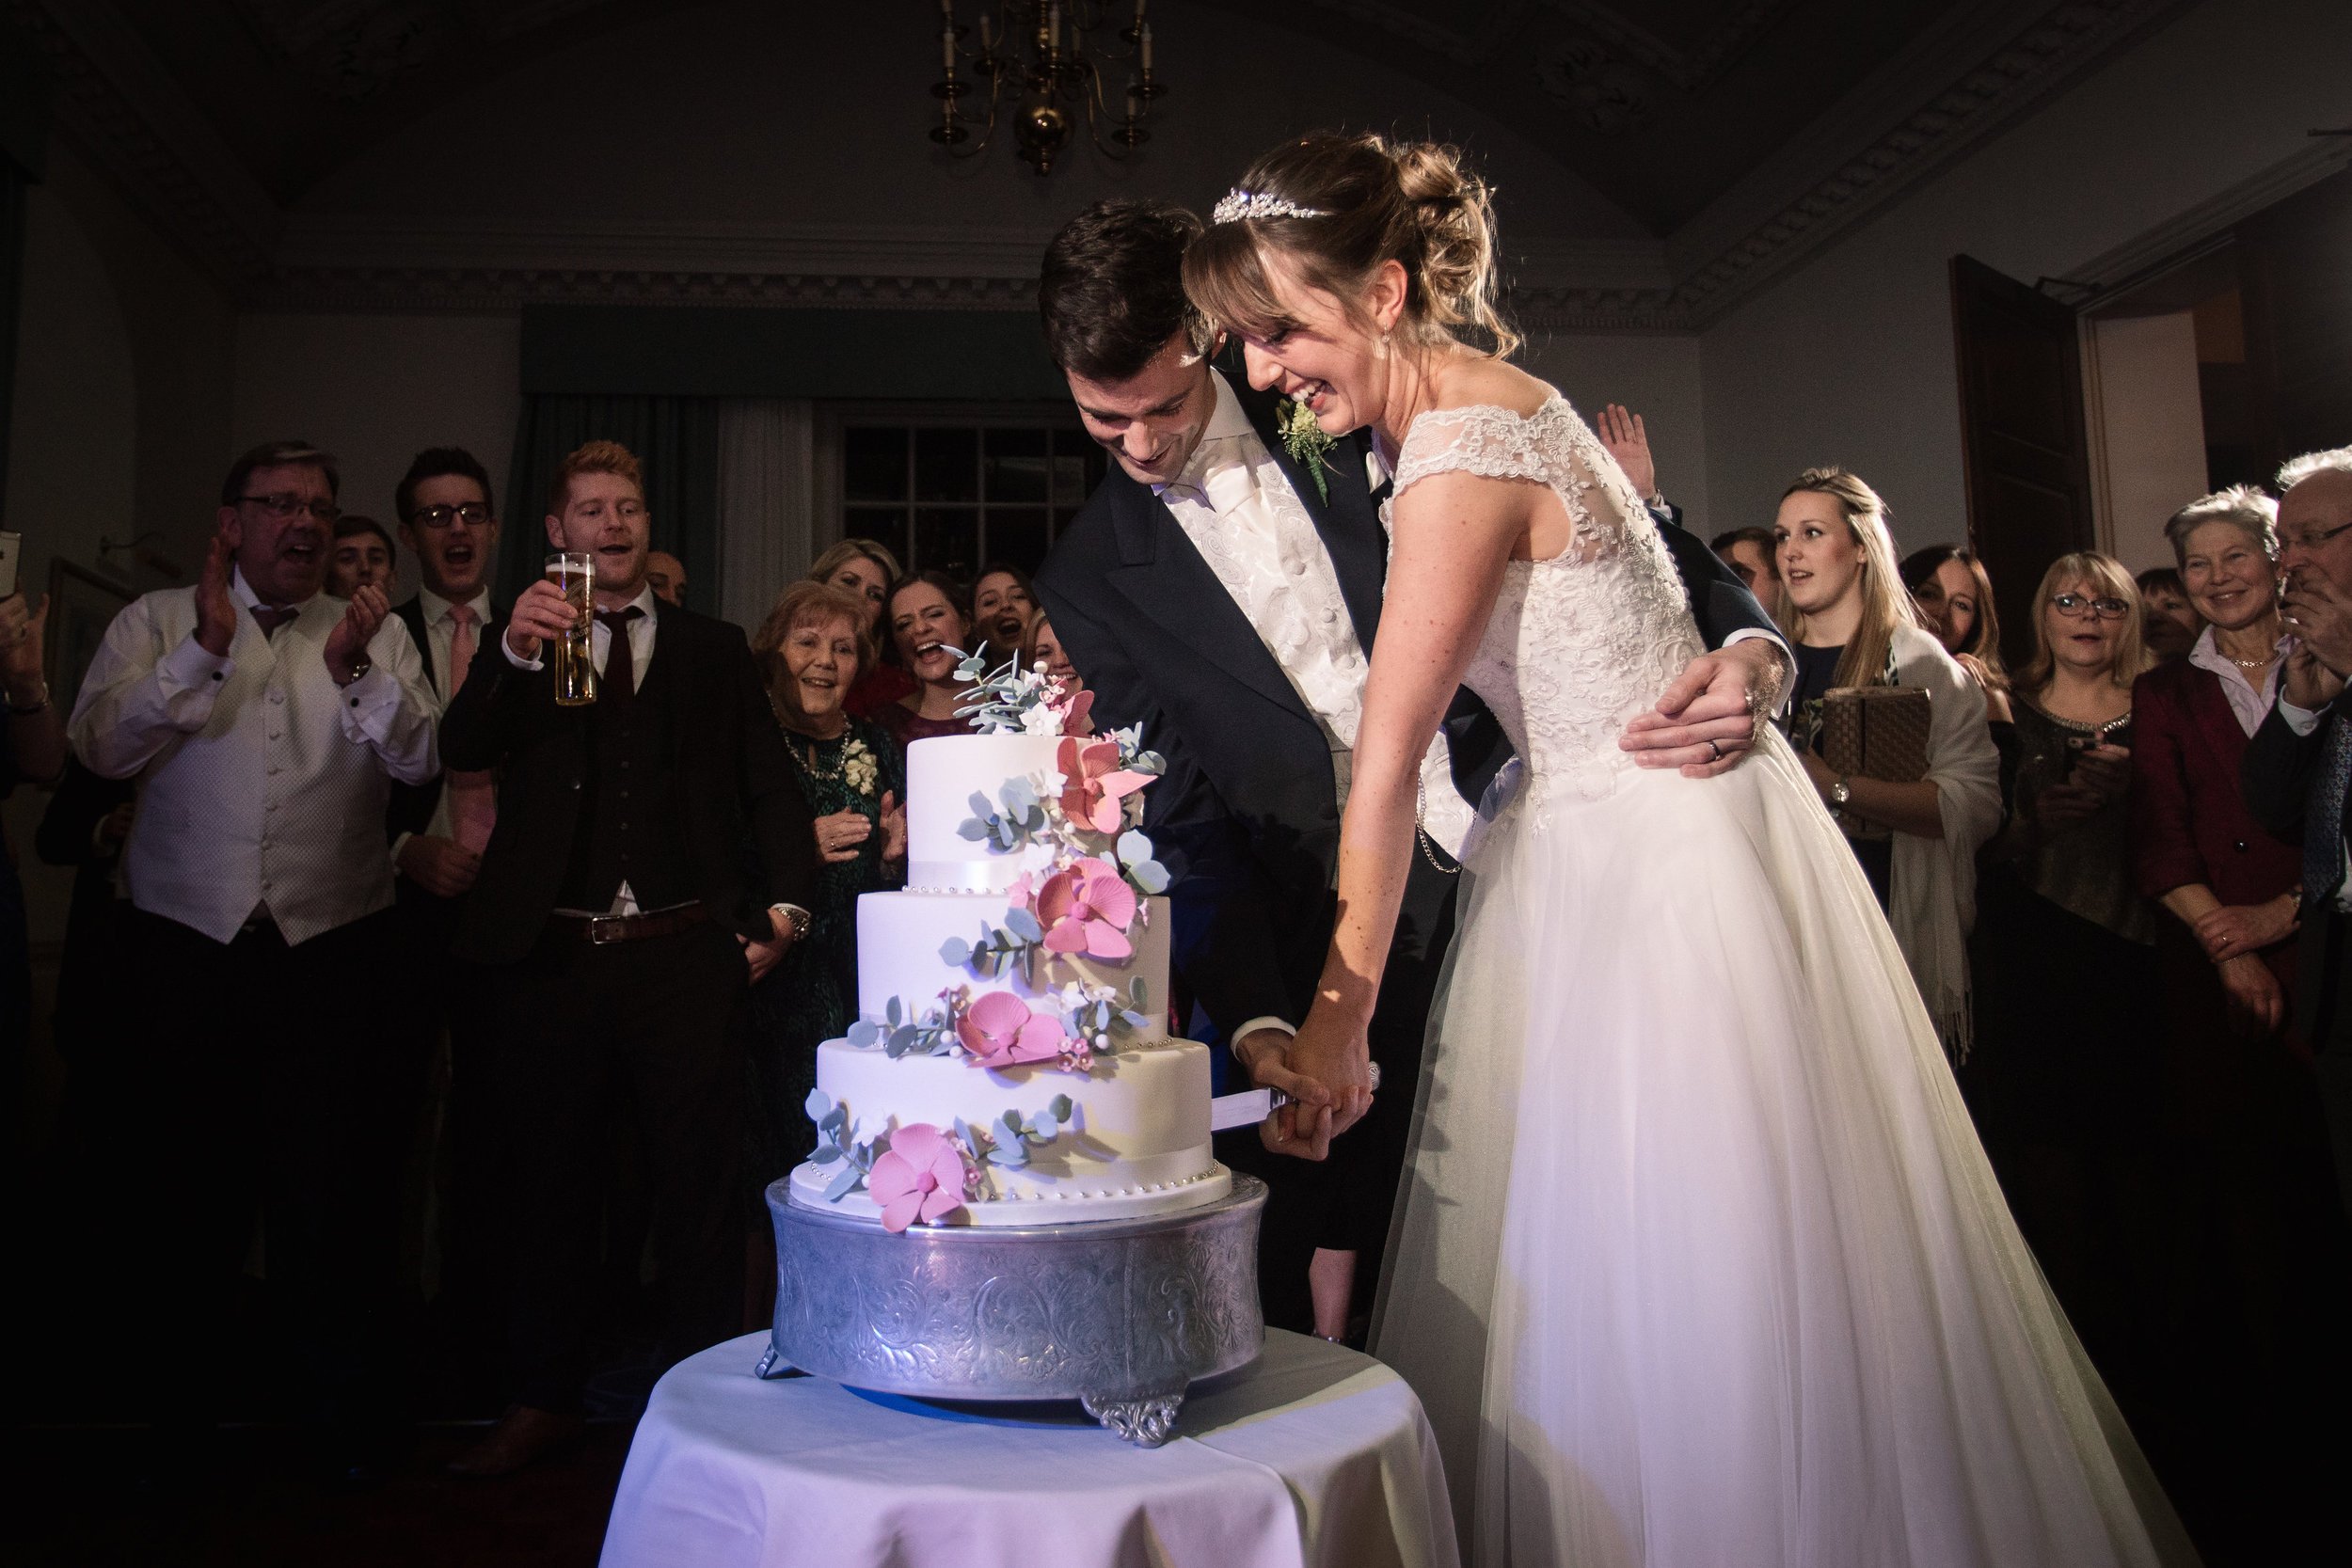 Elegant mansion house cake cutting wedding hertfordshire becky harley photography